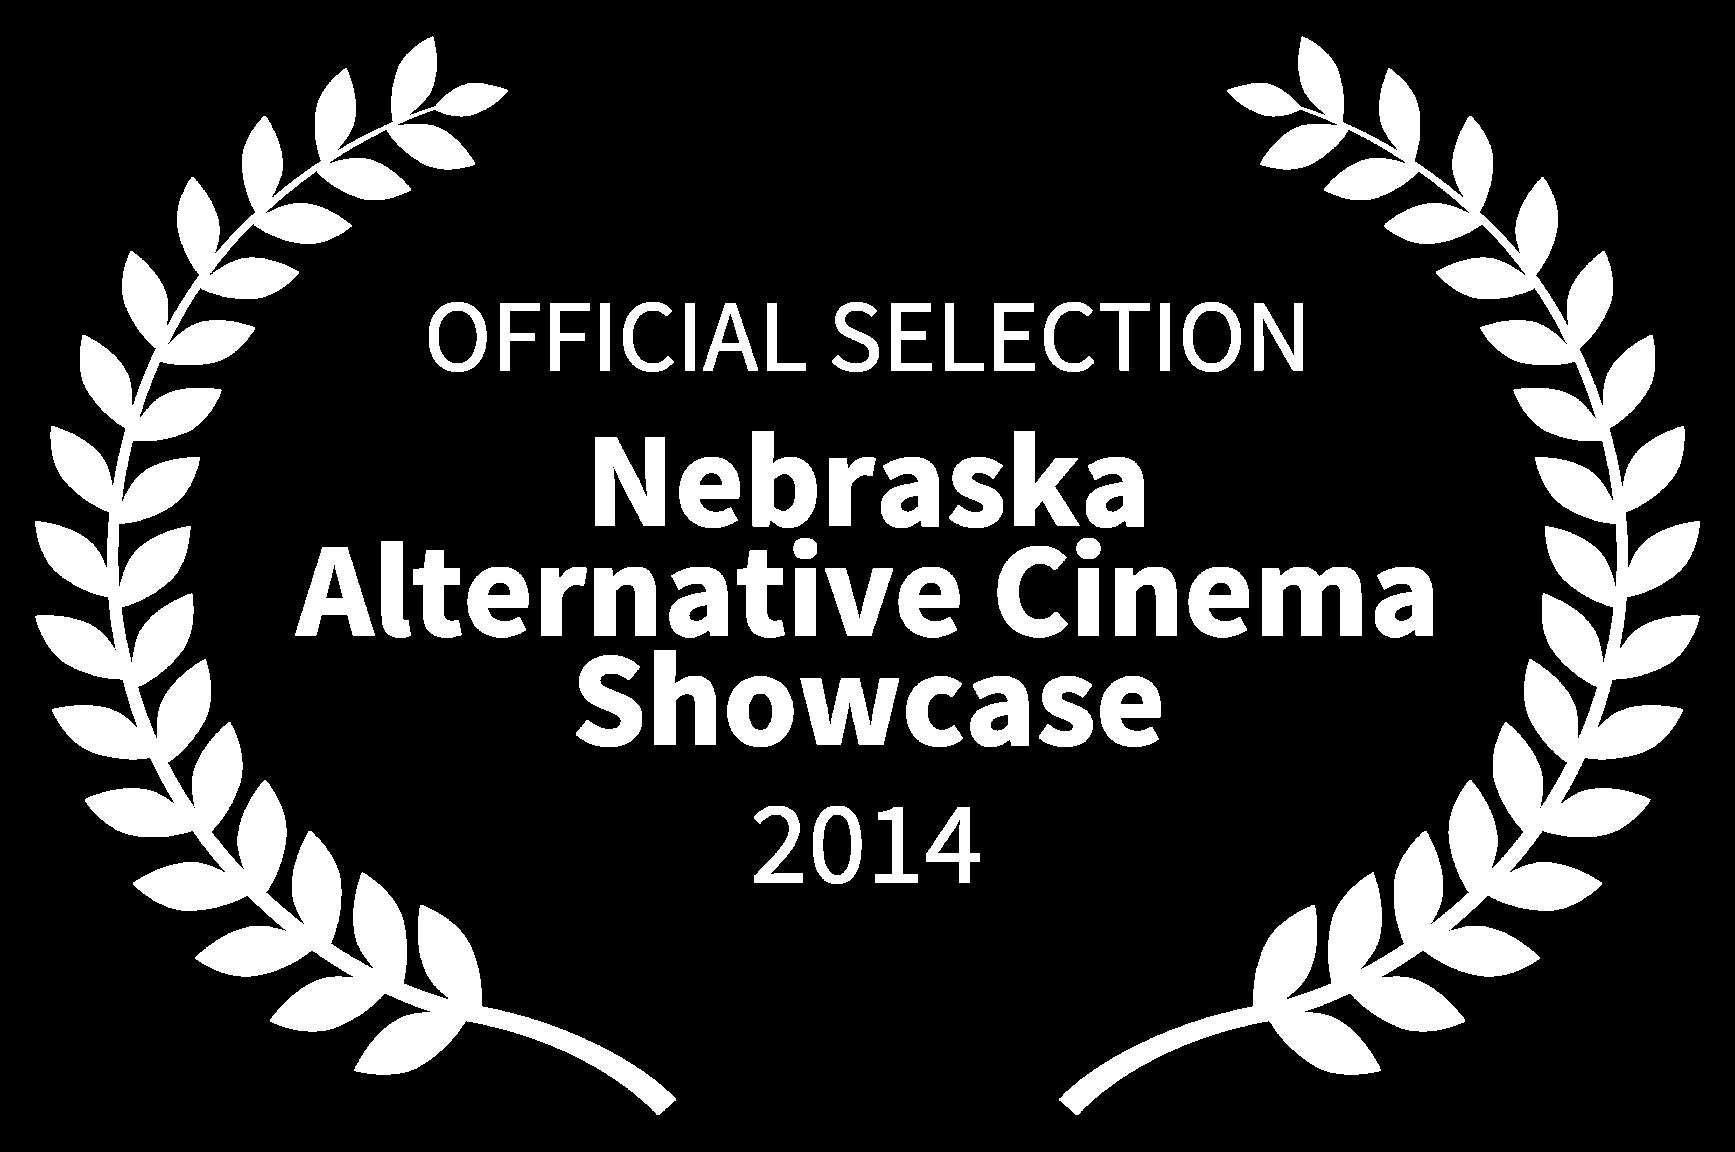 OFFICIAL SELECTION - Nebraska Alternative Cinema Showcase - 2014.png